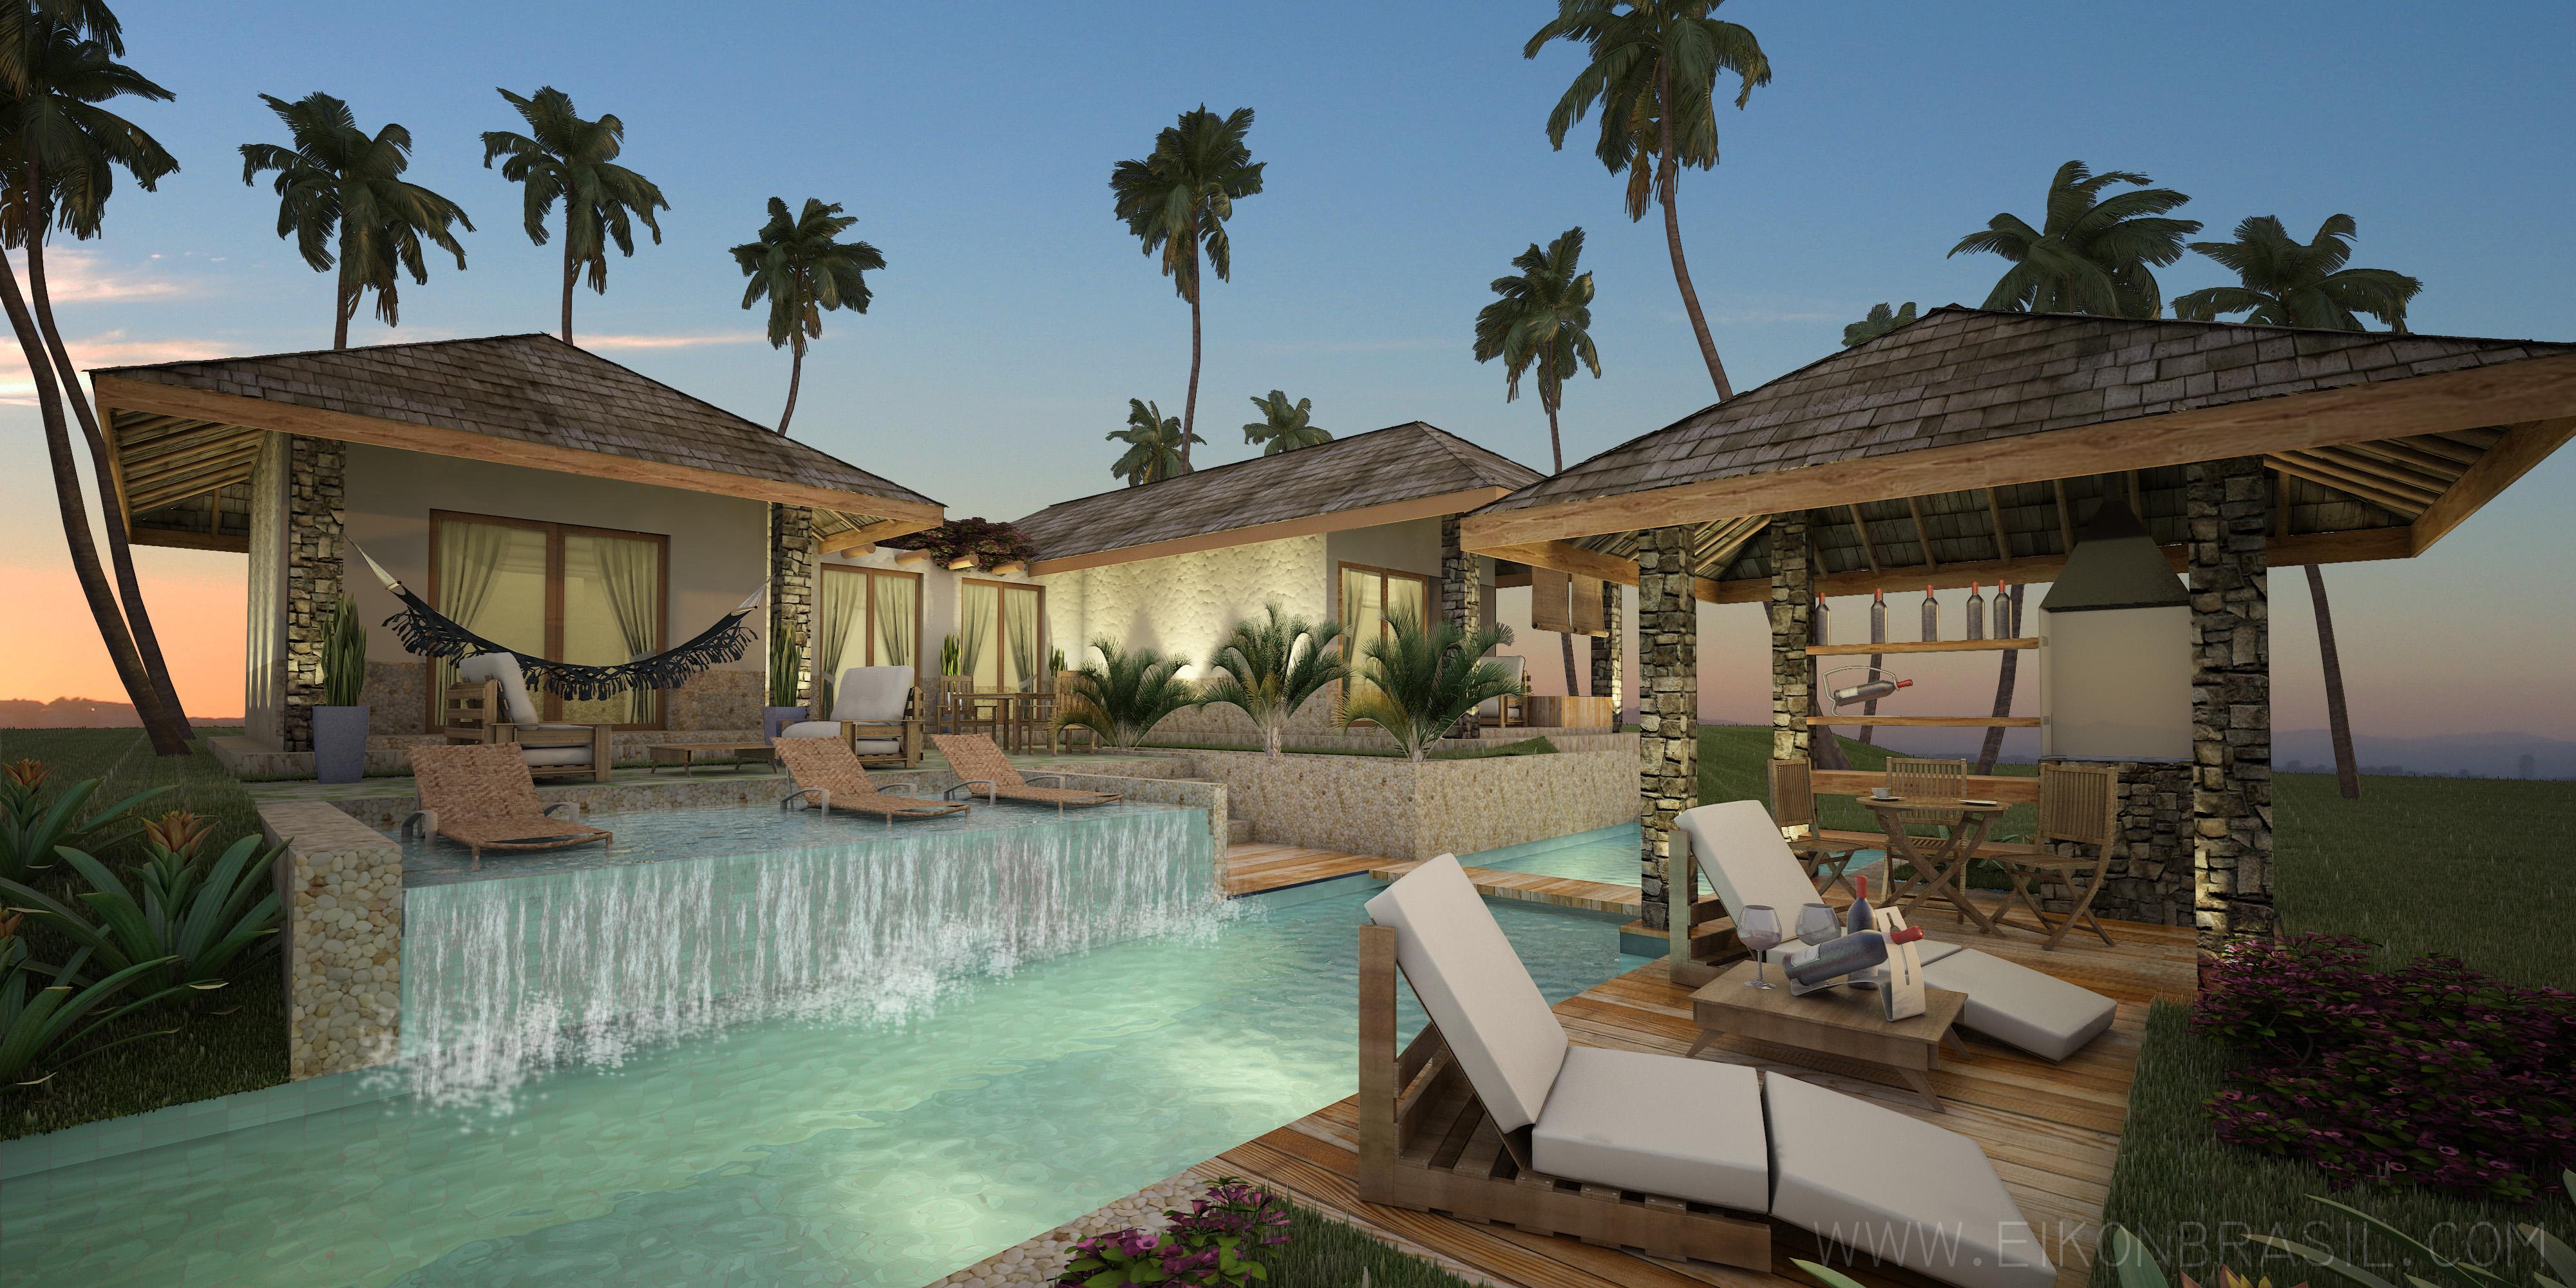 Casa - New House Model